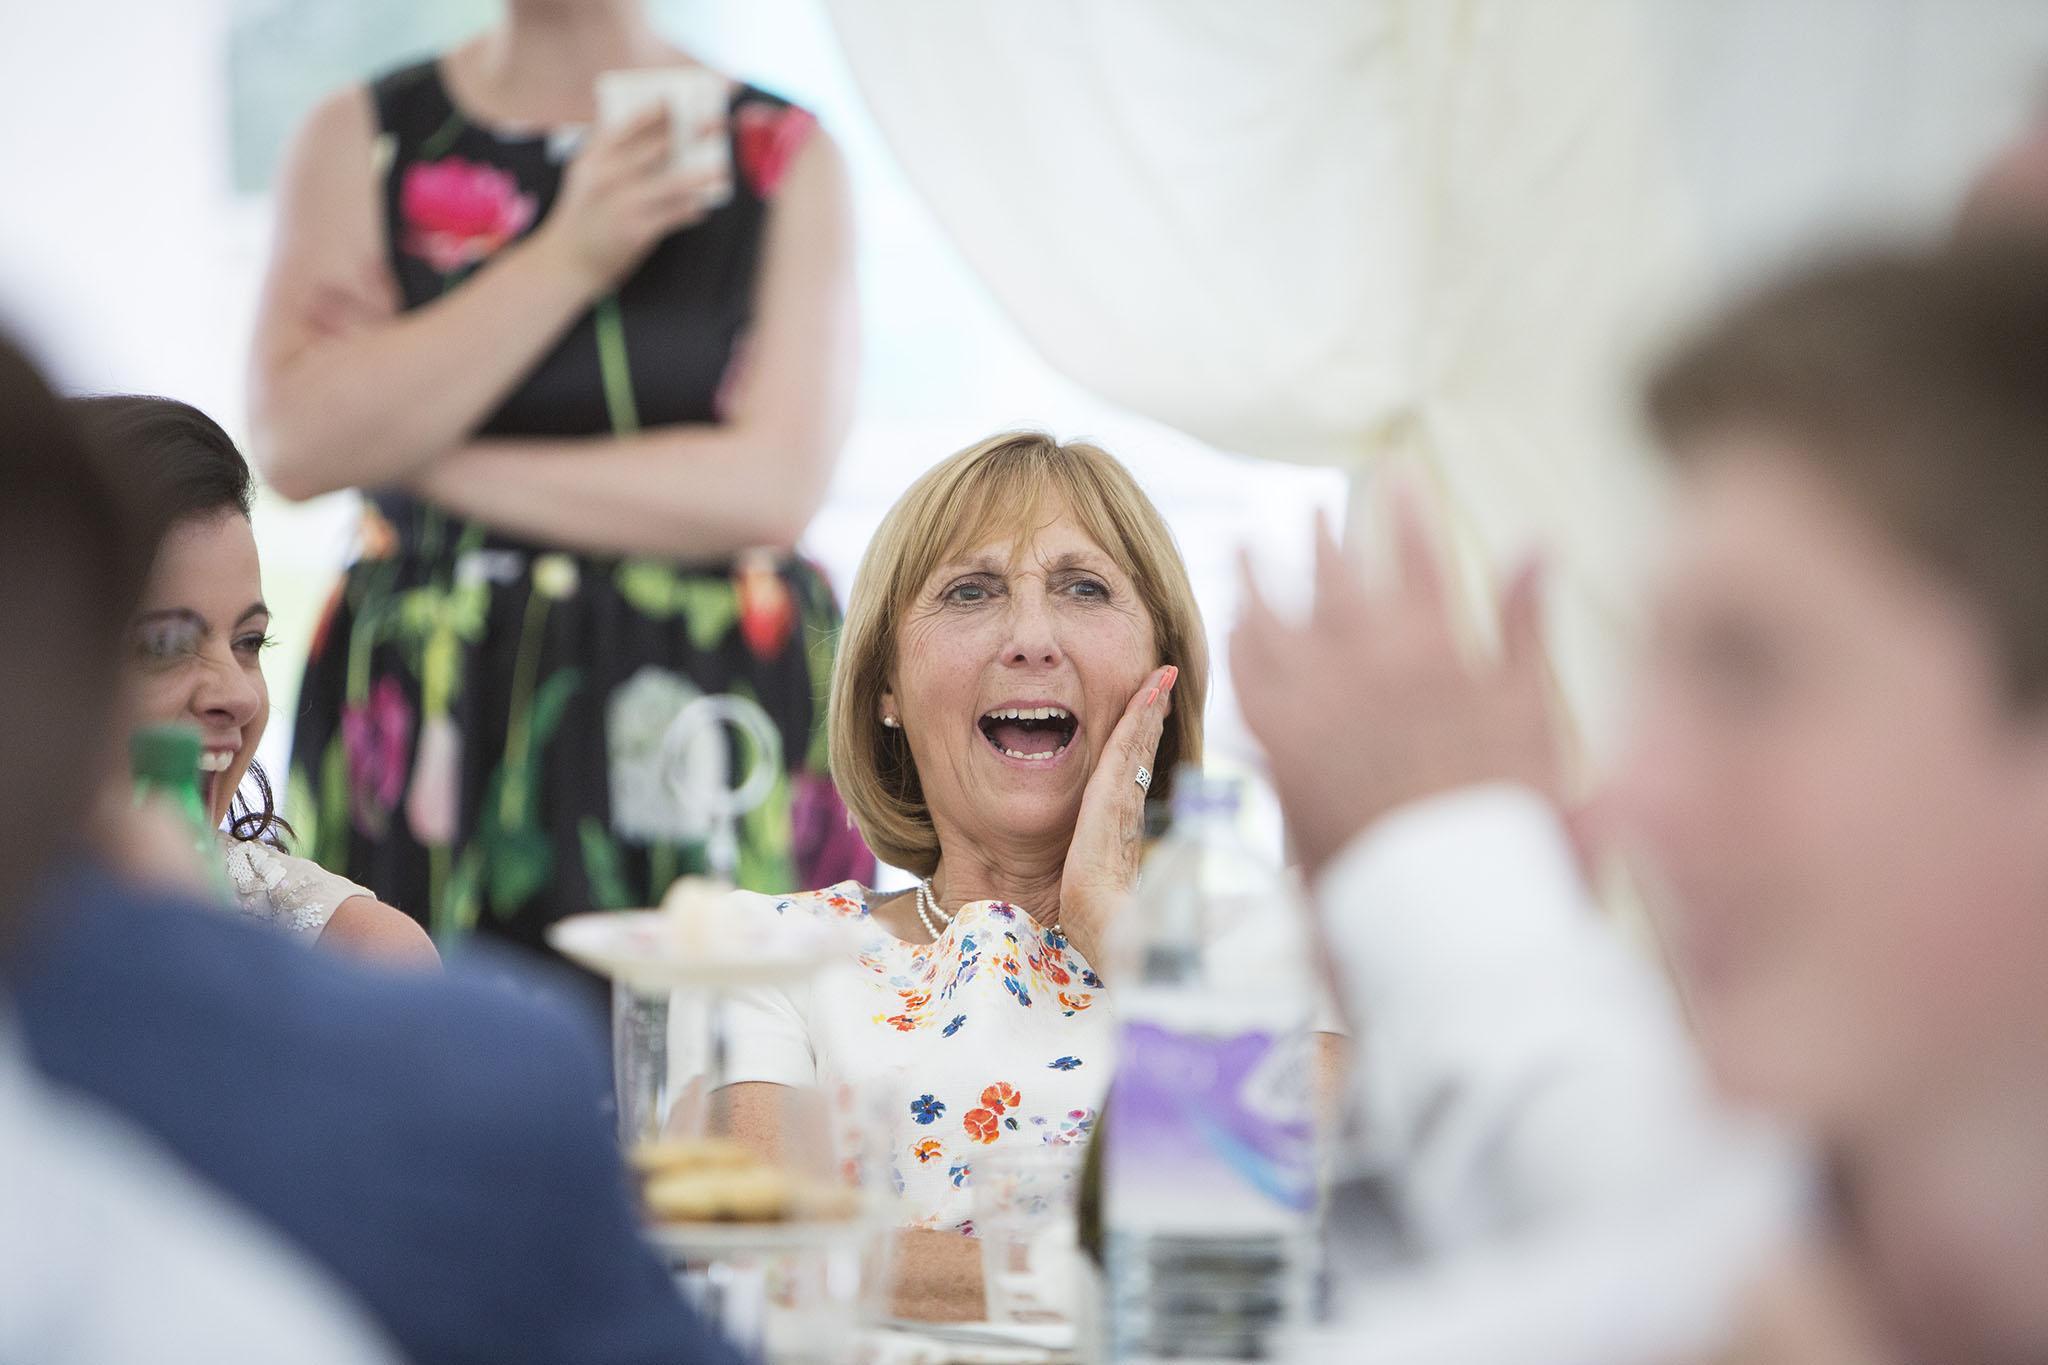 elizabethgphotography_kingslangley_hertfordshire_fineart_wedding_pottersbar_matt_katie_pegg_35.jpg